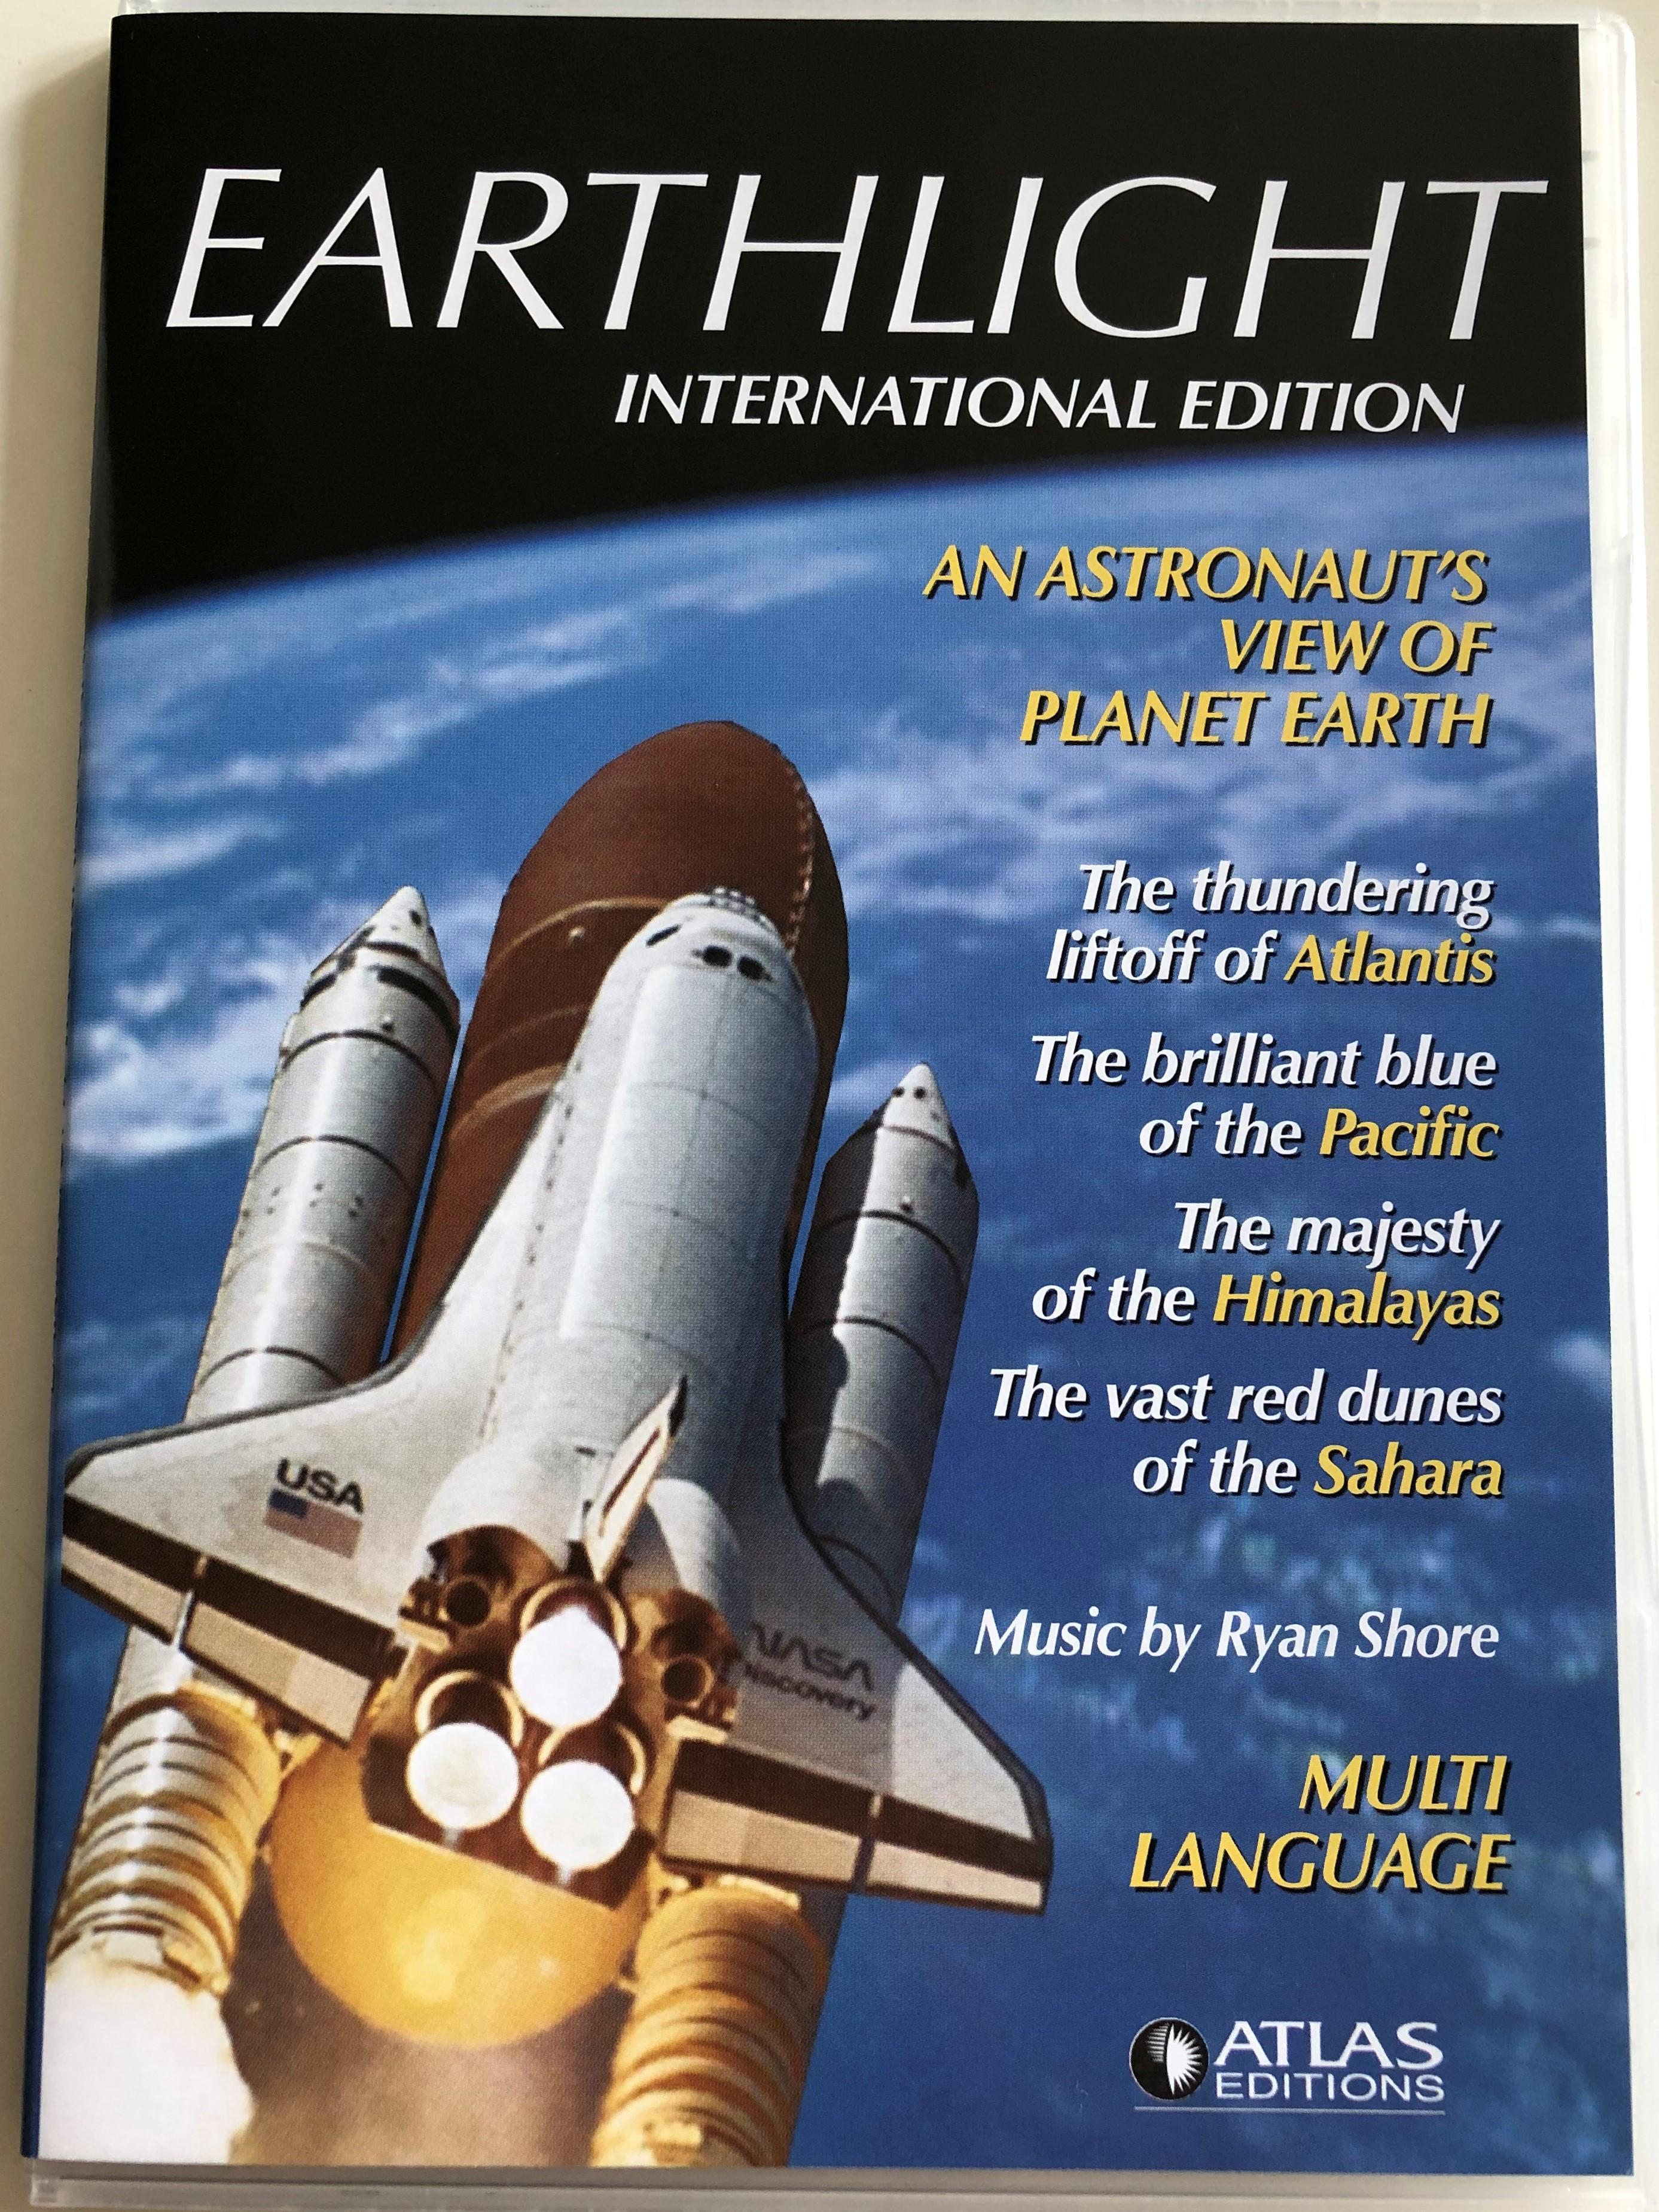 earthlight-internation-edition-dvd-2007-an-astronaut-s-view-of-planet-earth-28-digital-video-nasa-earthviews-multi-language-polish-hungarian-french-english-german-russian-romanian-dutch-czech-swedish-atlas-editio-1-.jpg